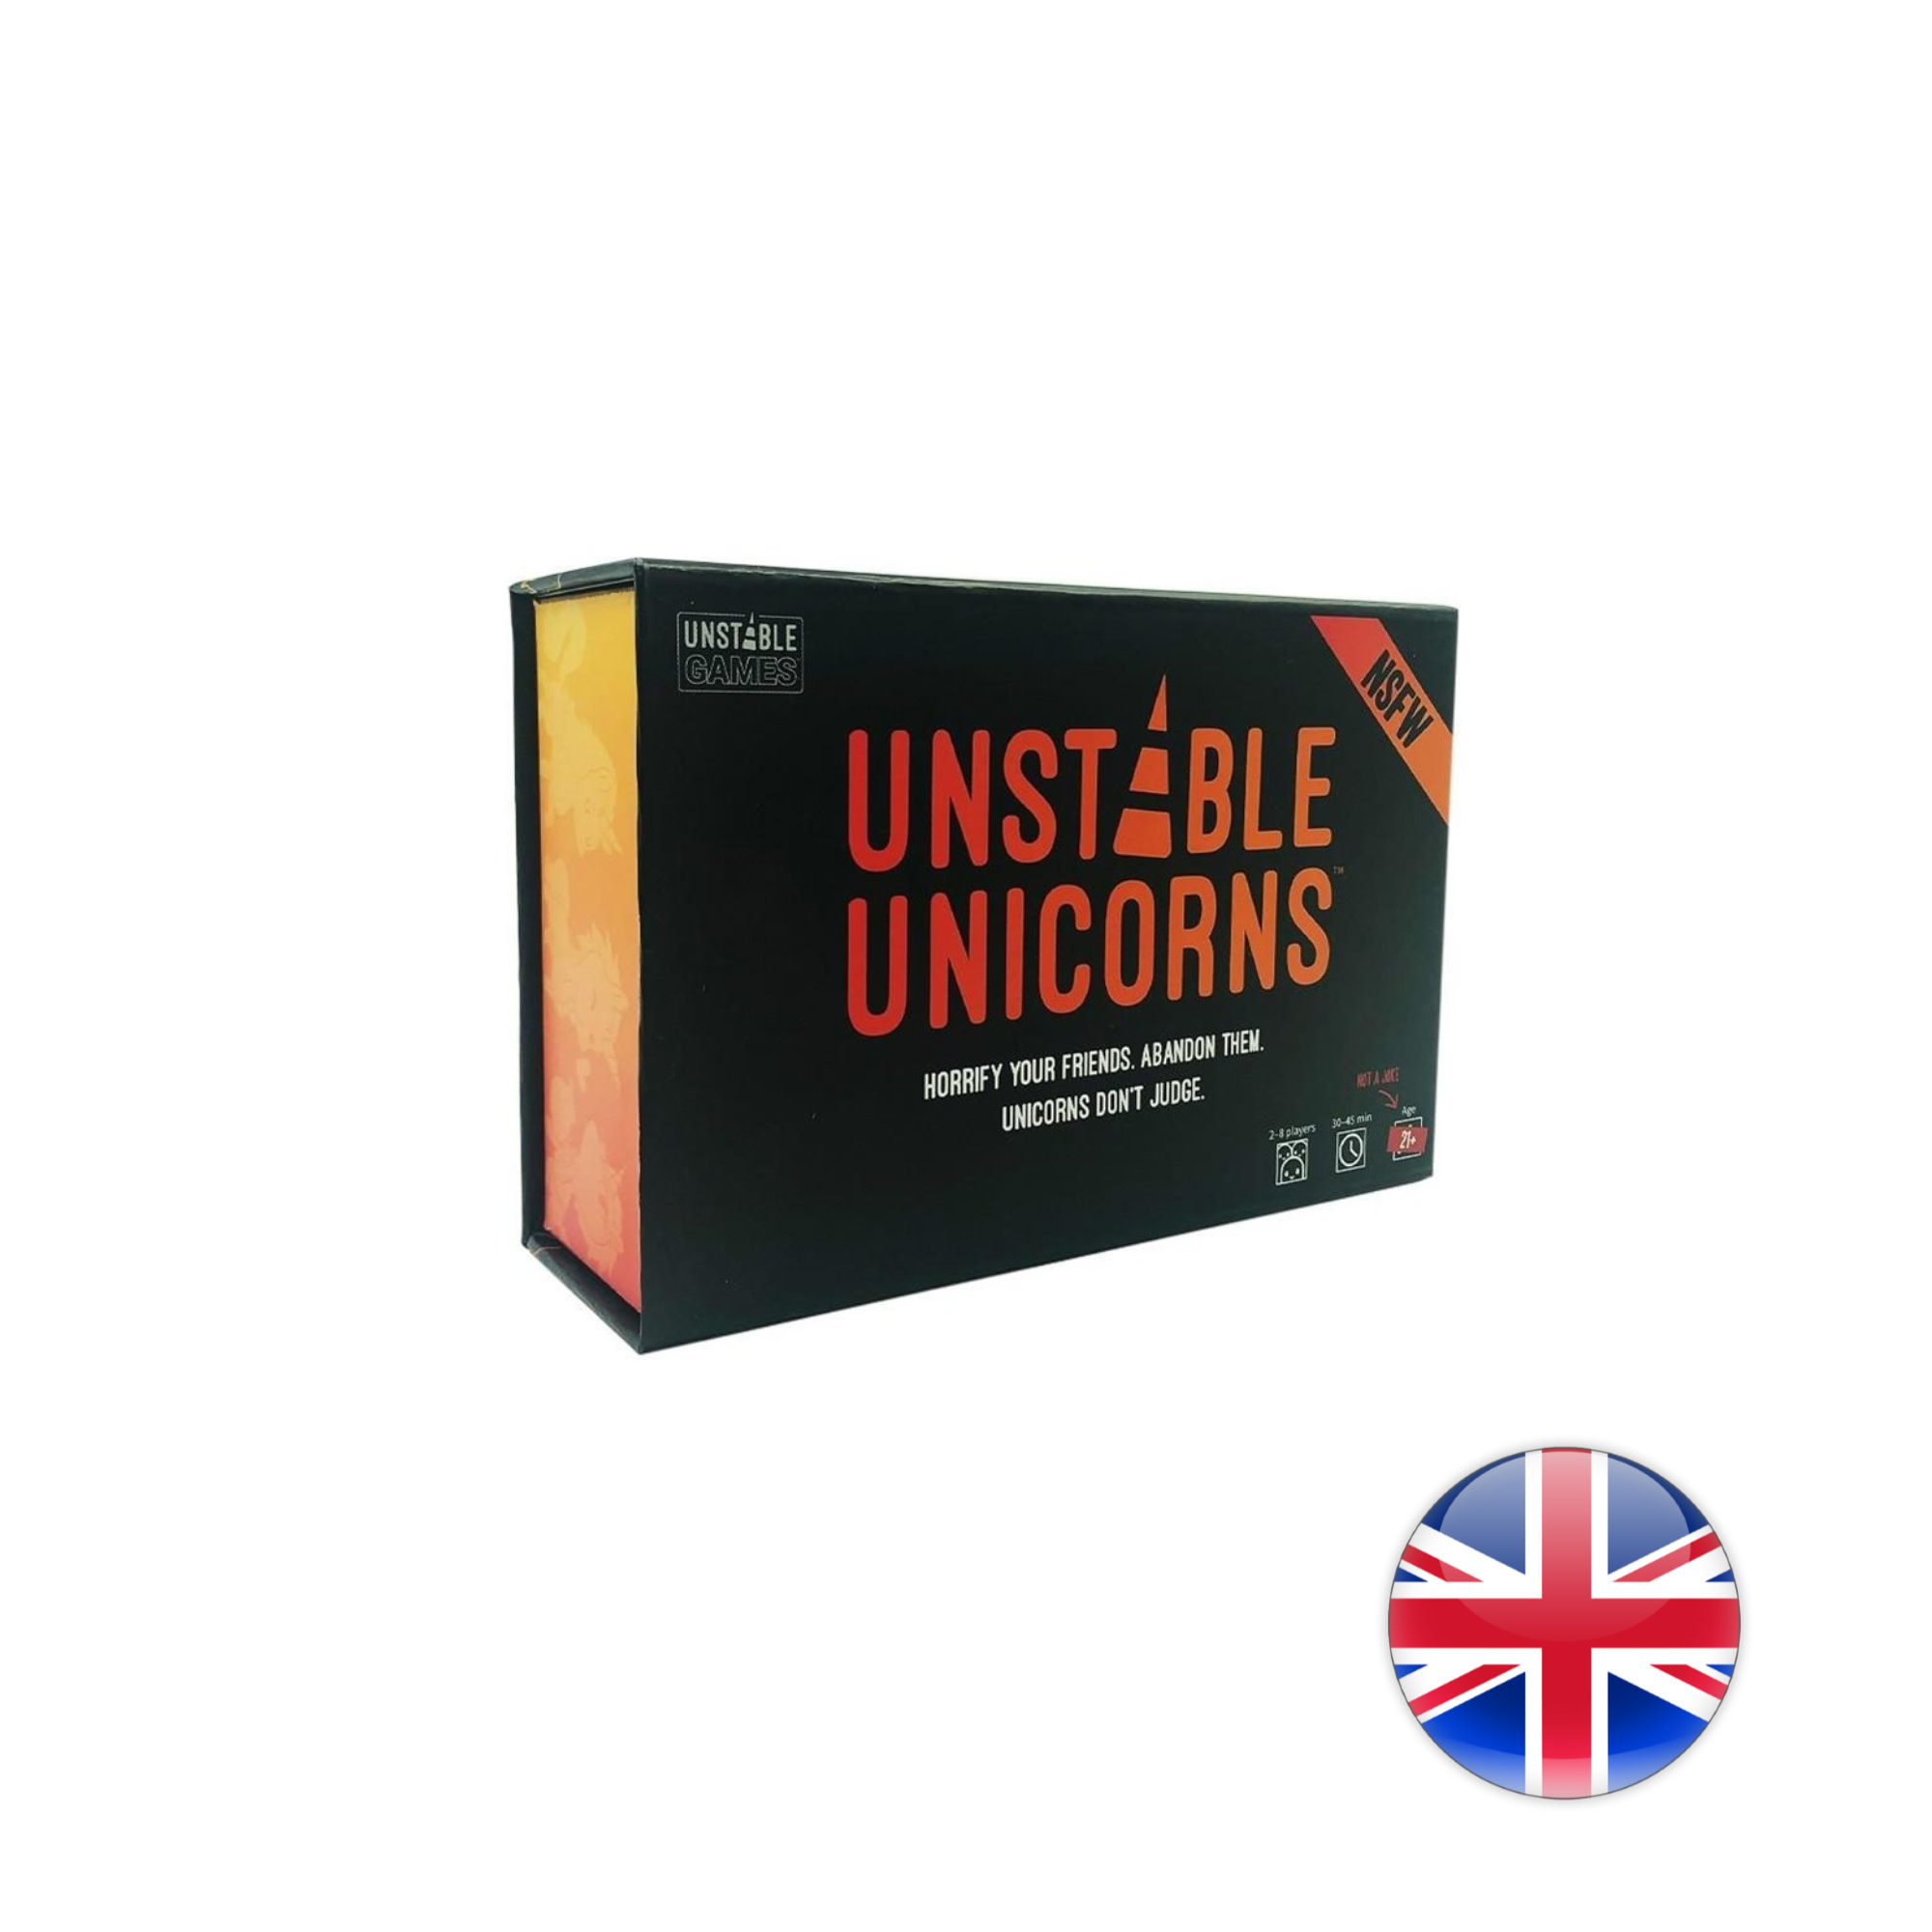 Breaking Games Unstable Unicorns NSFW